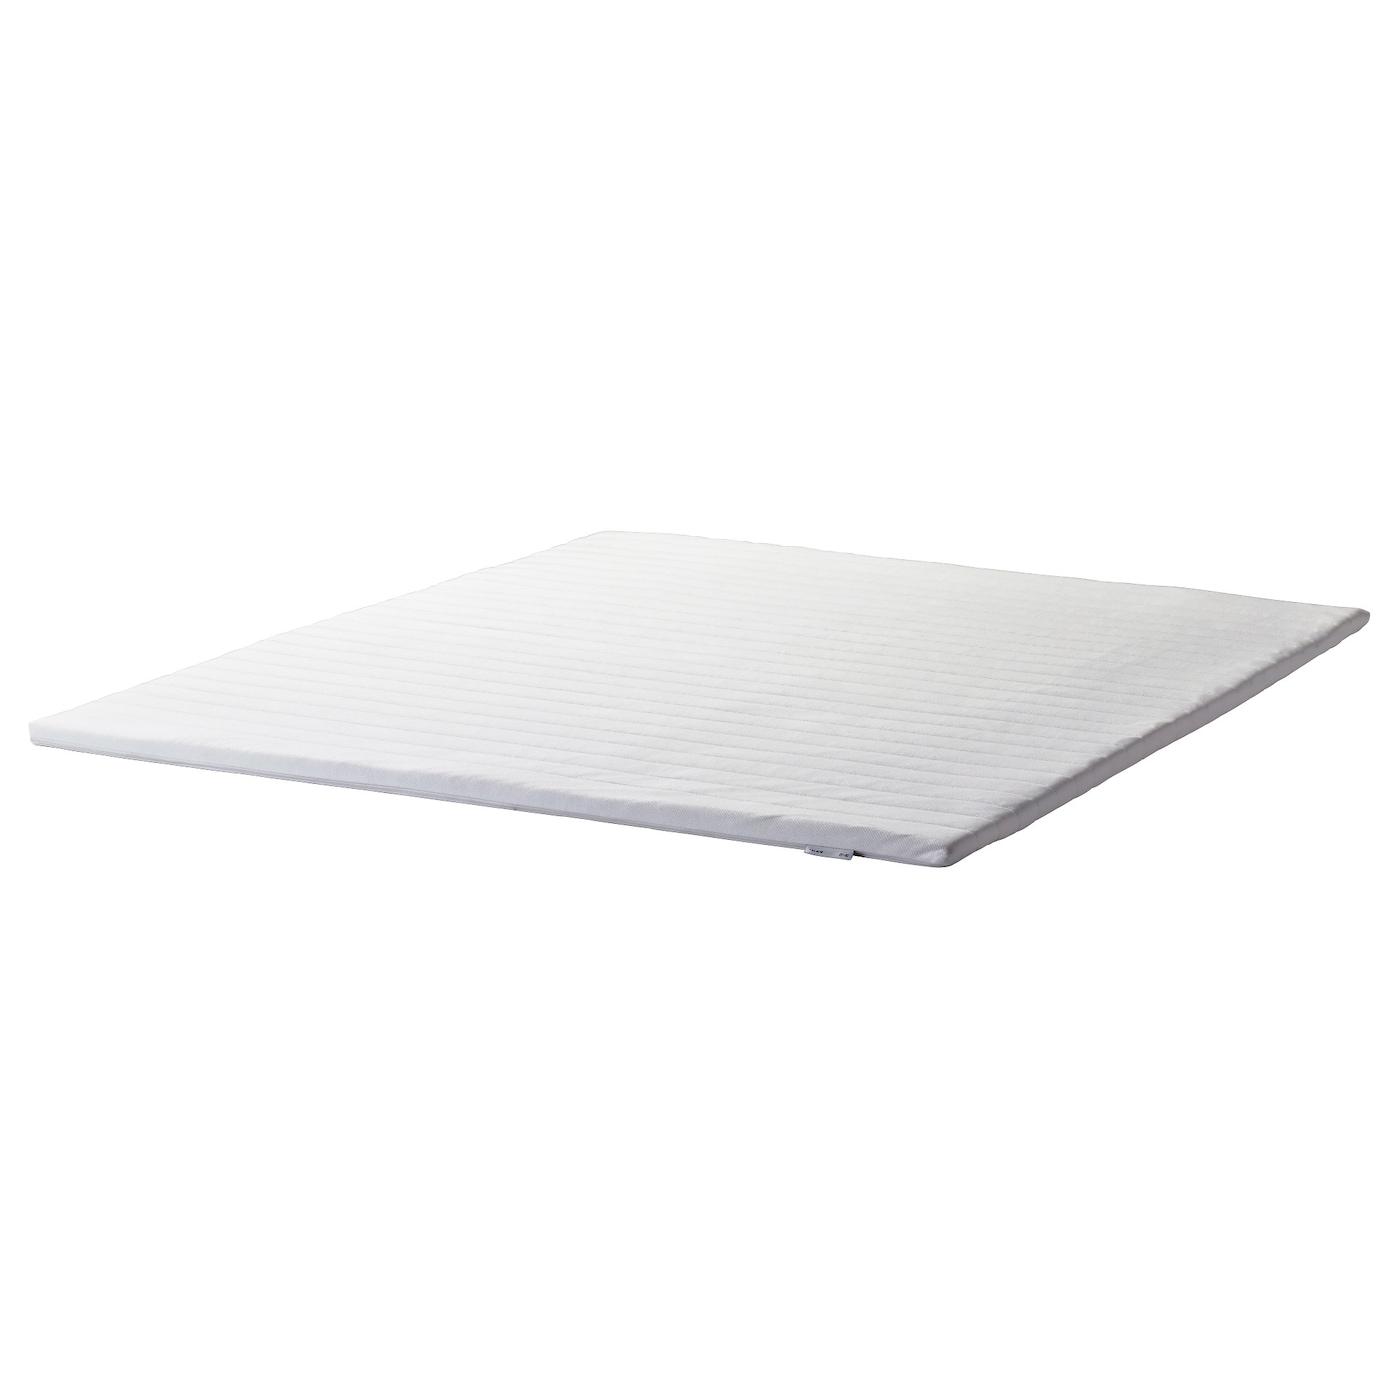 mattress toppers ikea ireland dublin. Black Bedroom Furniture Sets. Home Design Ideas